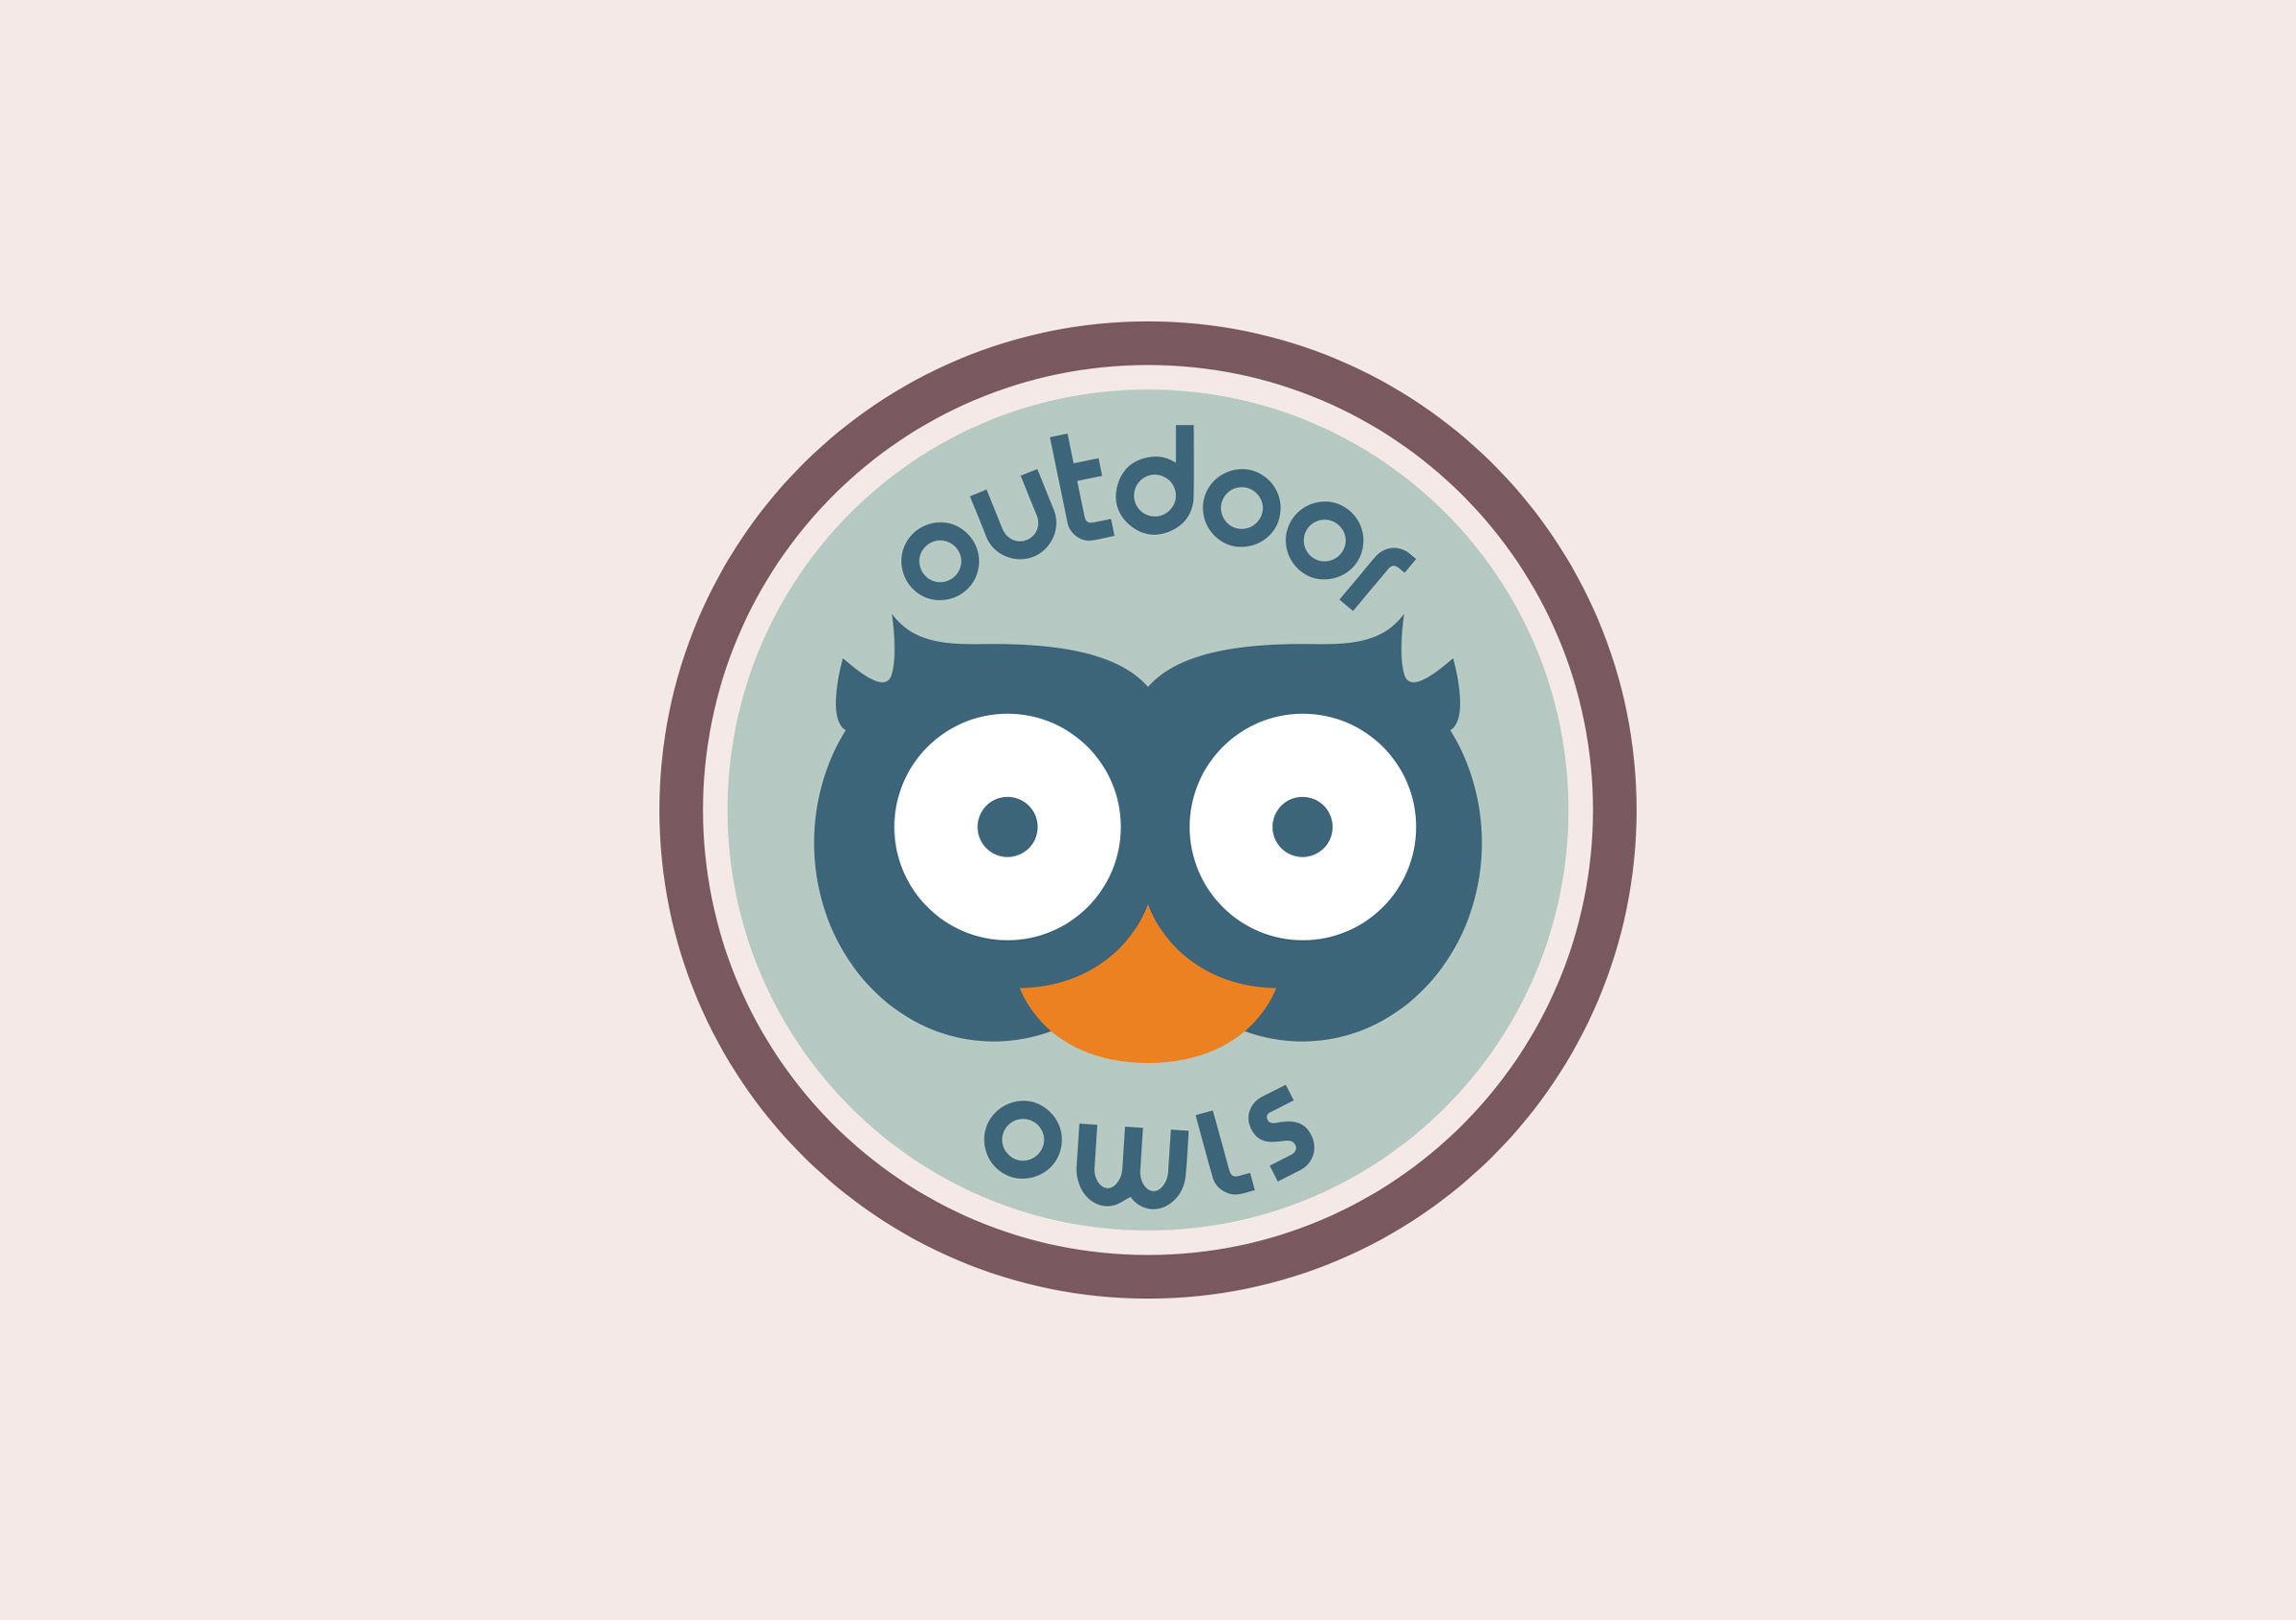 YourDesignMark-OutdoorOwls-1logo1